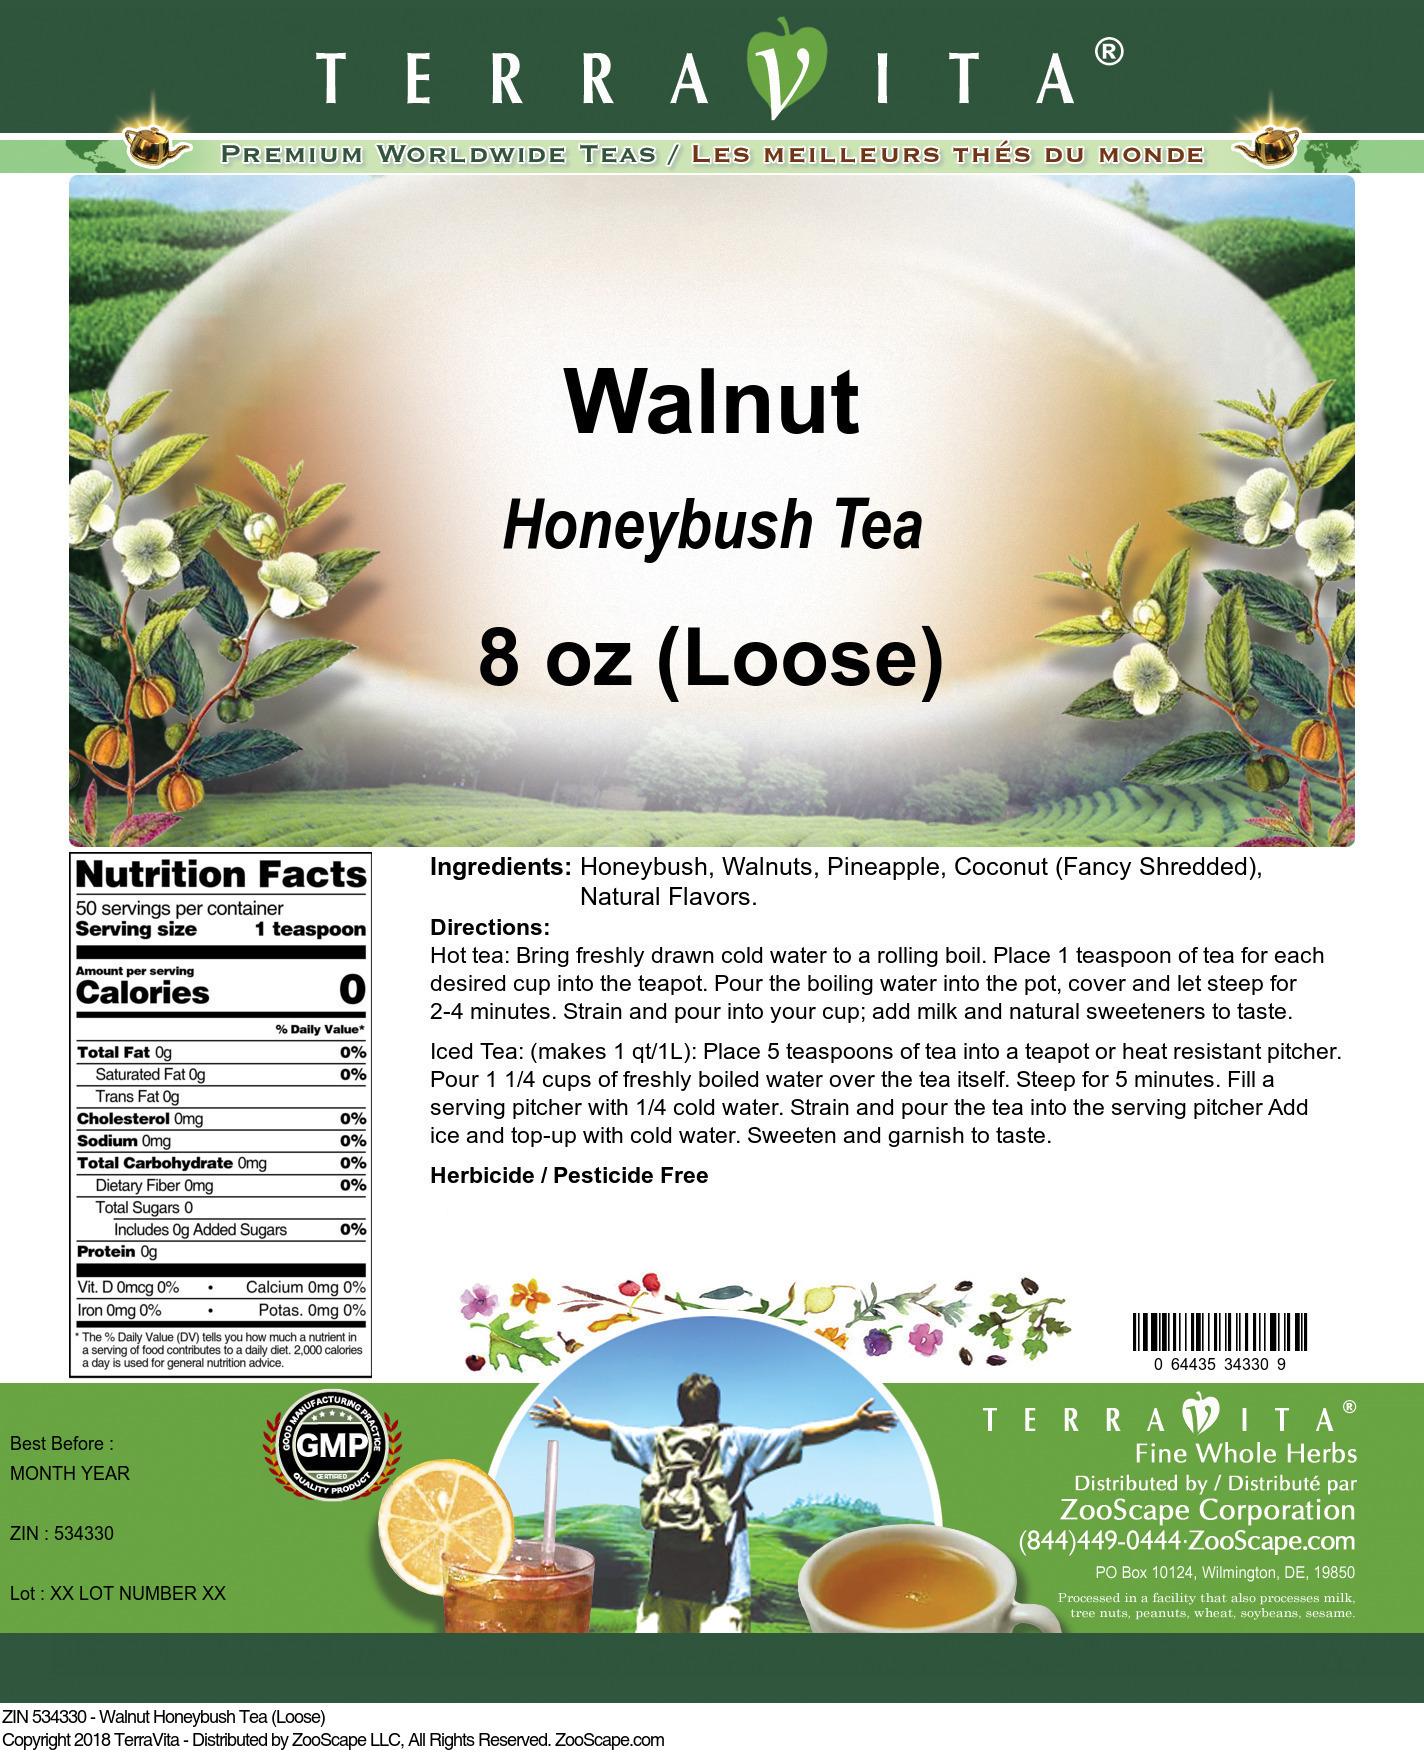 Walnut Honeybush Tea